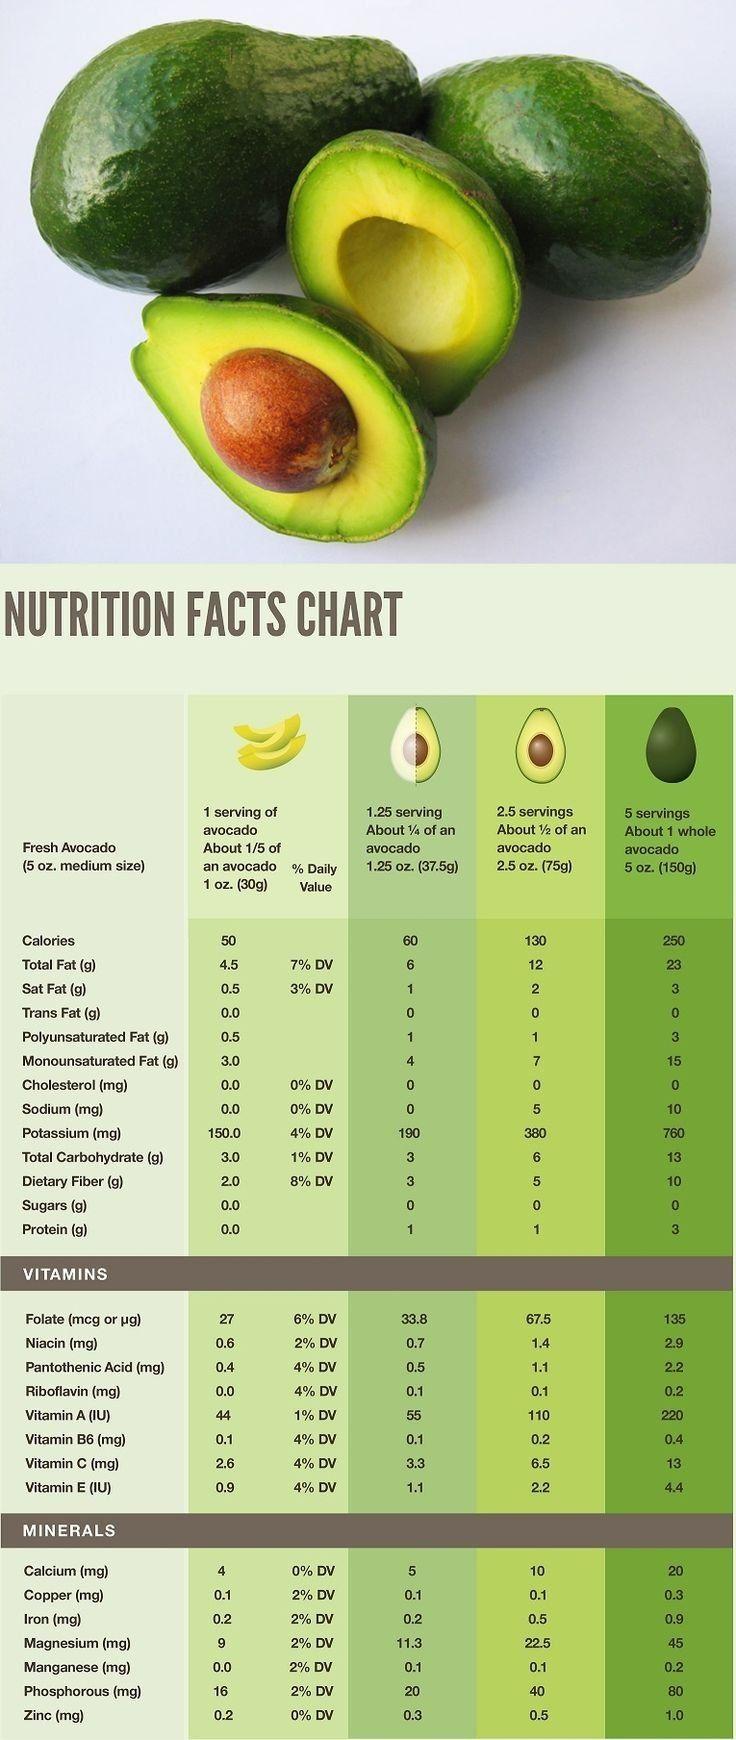 Health Benefits of Avocados!